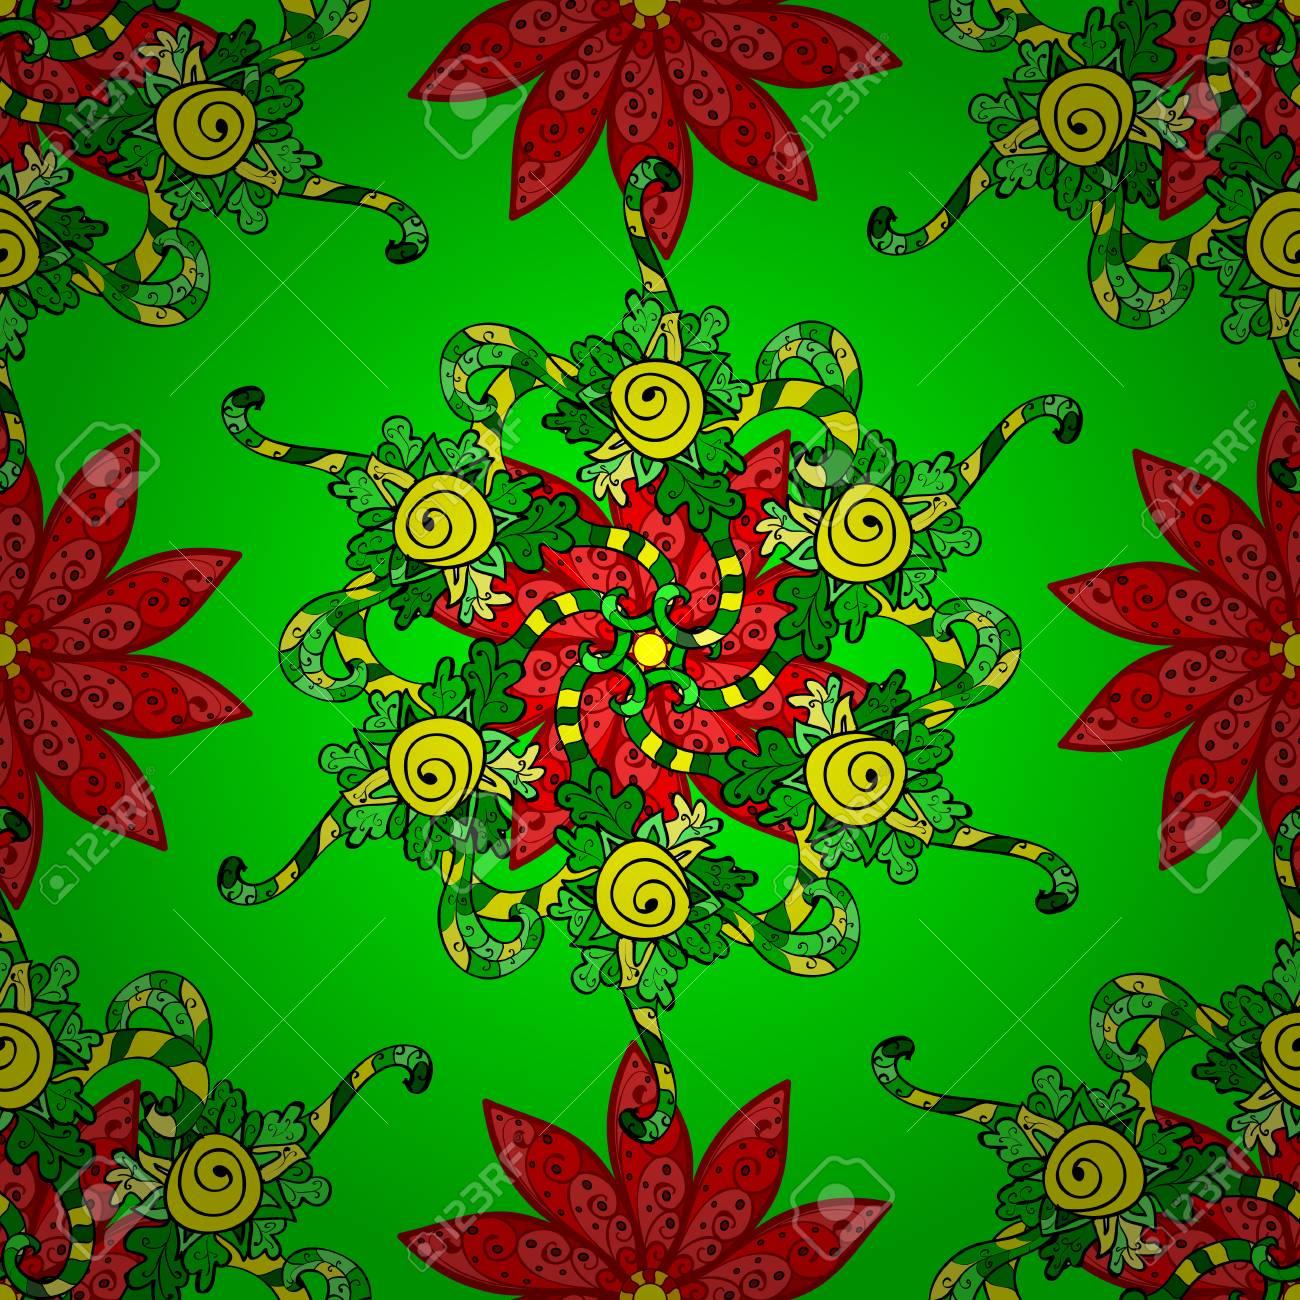 Dorable Colorear Flores De Verano Ornamento - Dibujos Para Colorear ...